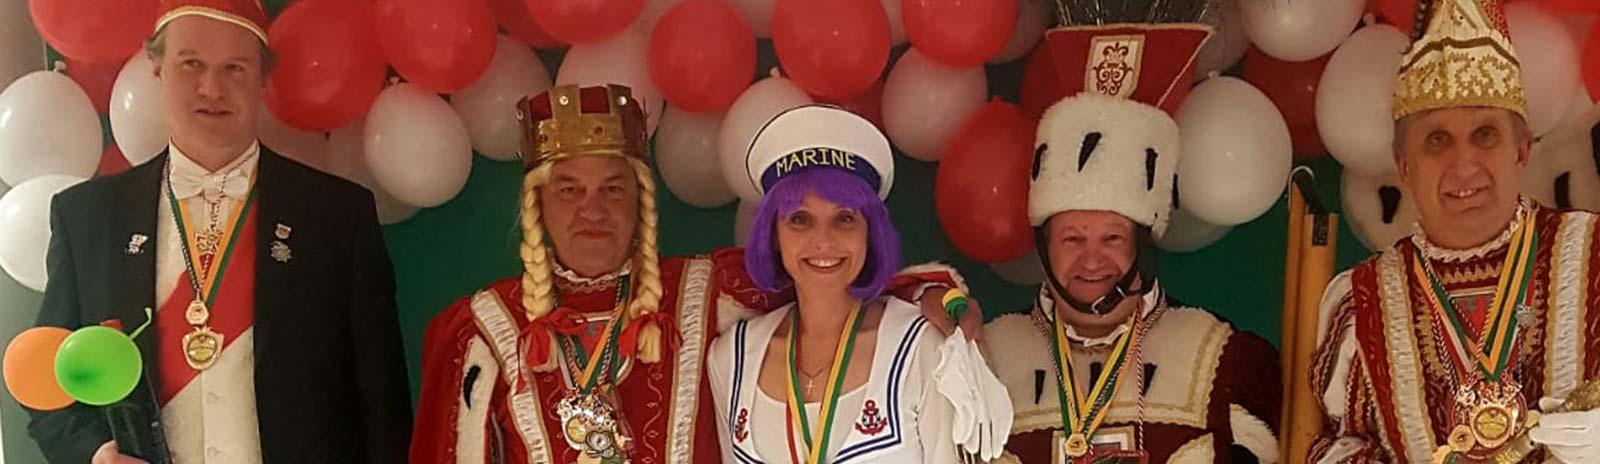 2019_02_15_Haus_Marienhöhe_Karneval_slider